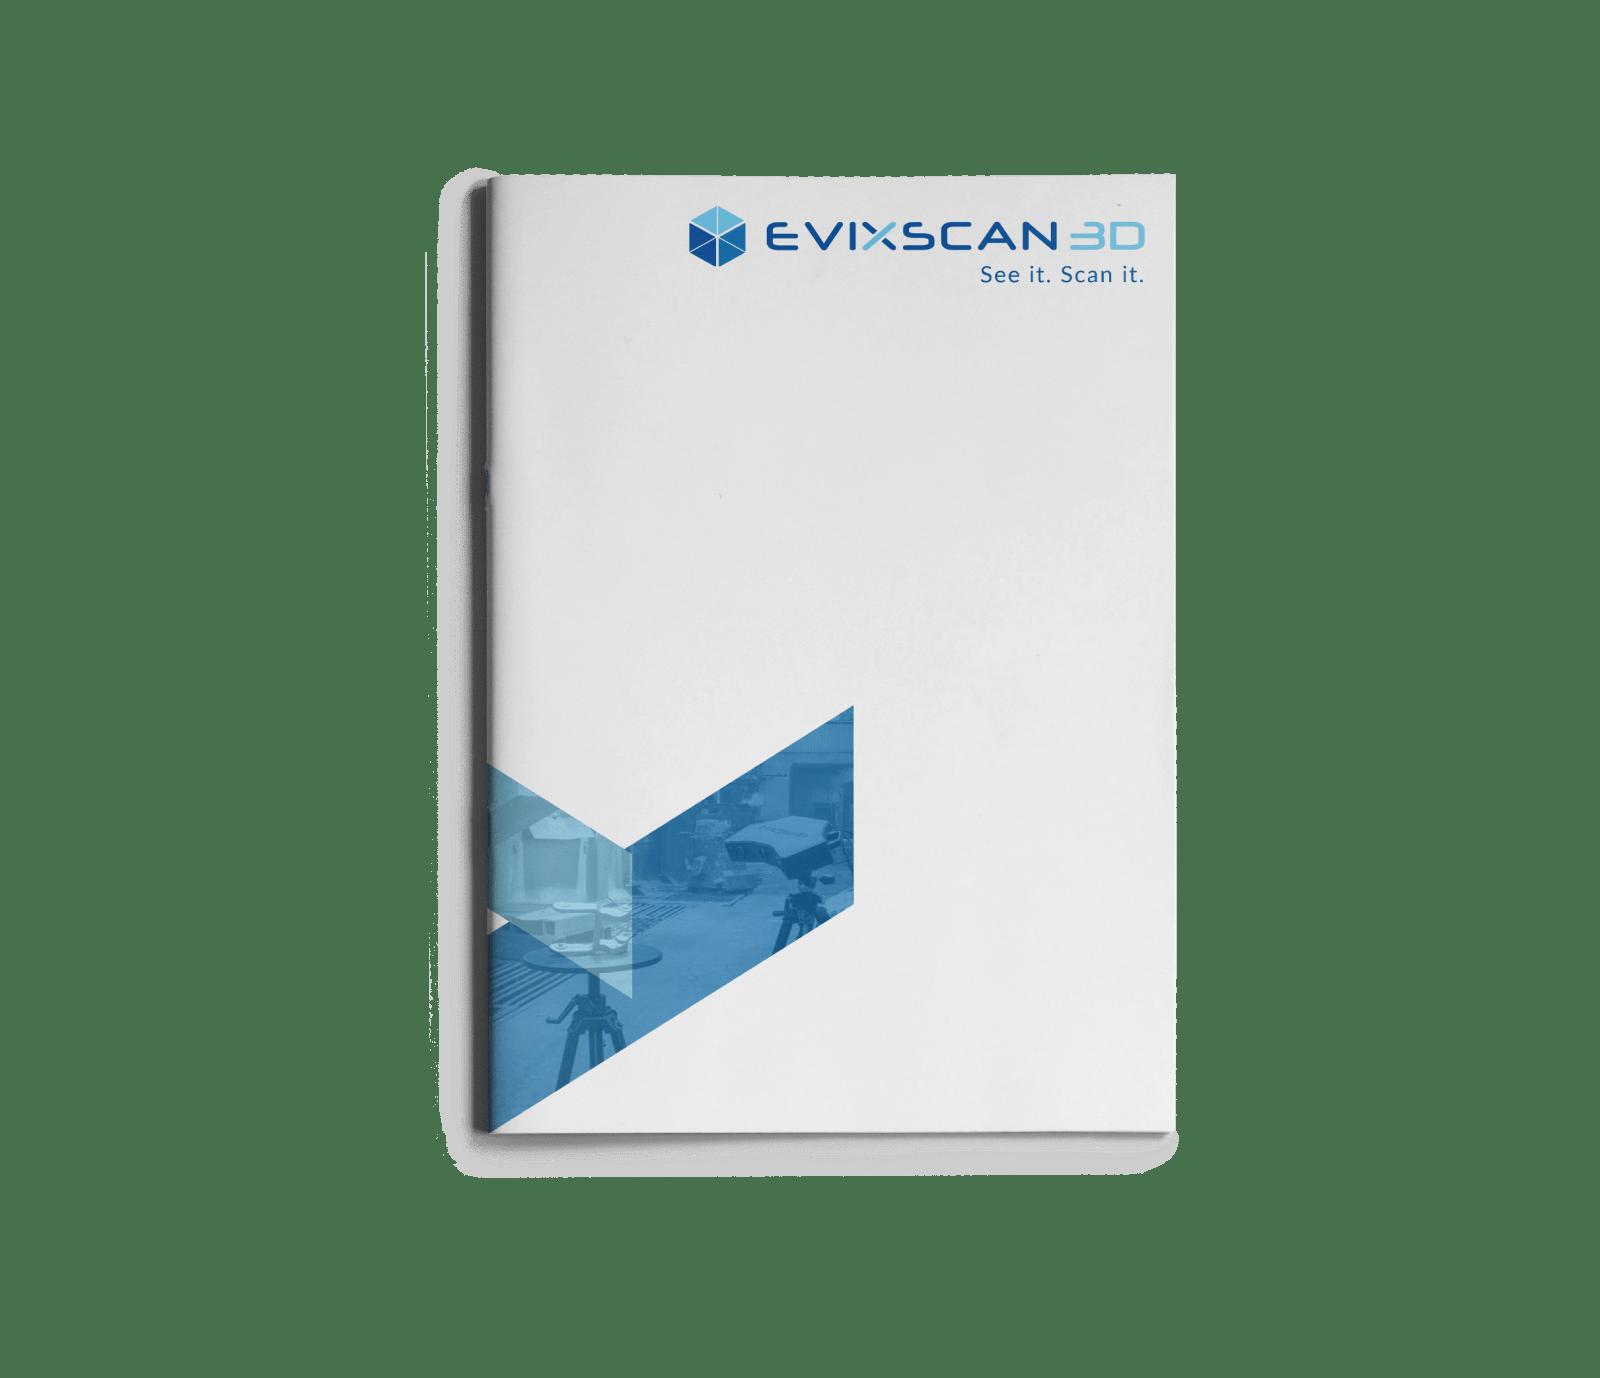 evixscan 3d foldery reklamowe (4)